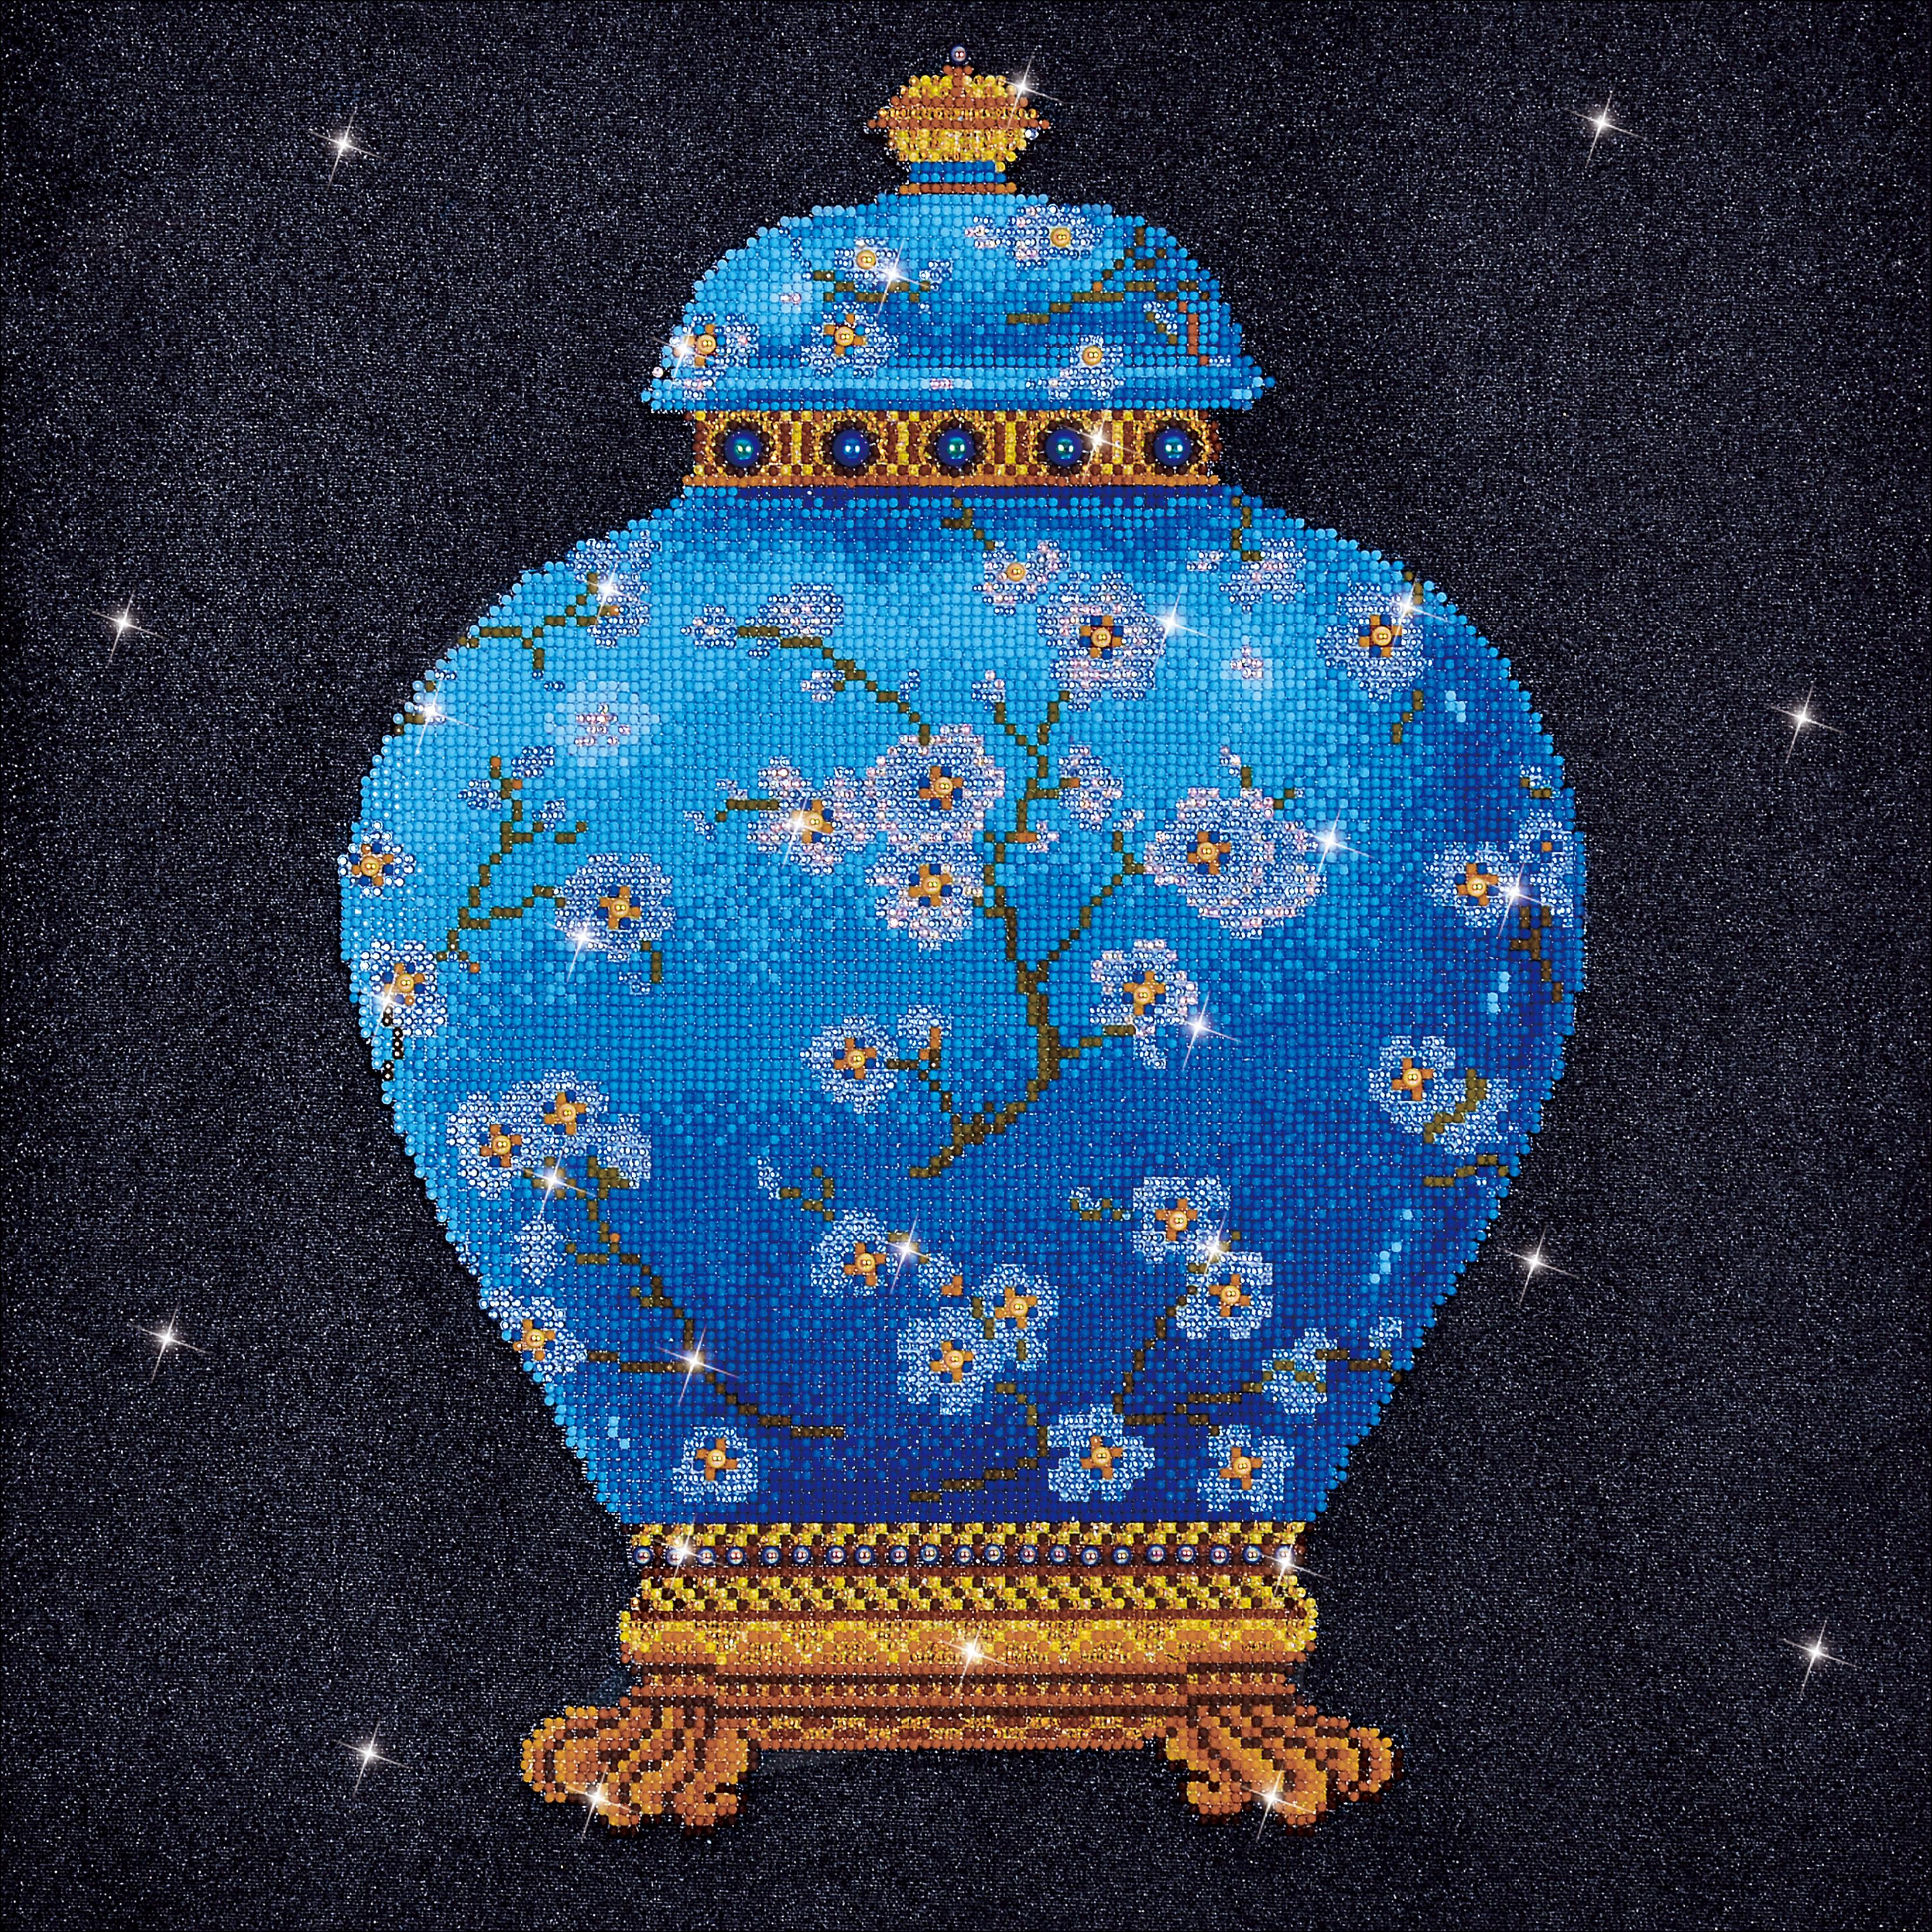 Diamond Dotz Diamond Embroidery Facet Art Kit 23.5X23.5-Blue Vase